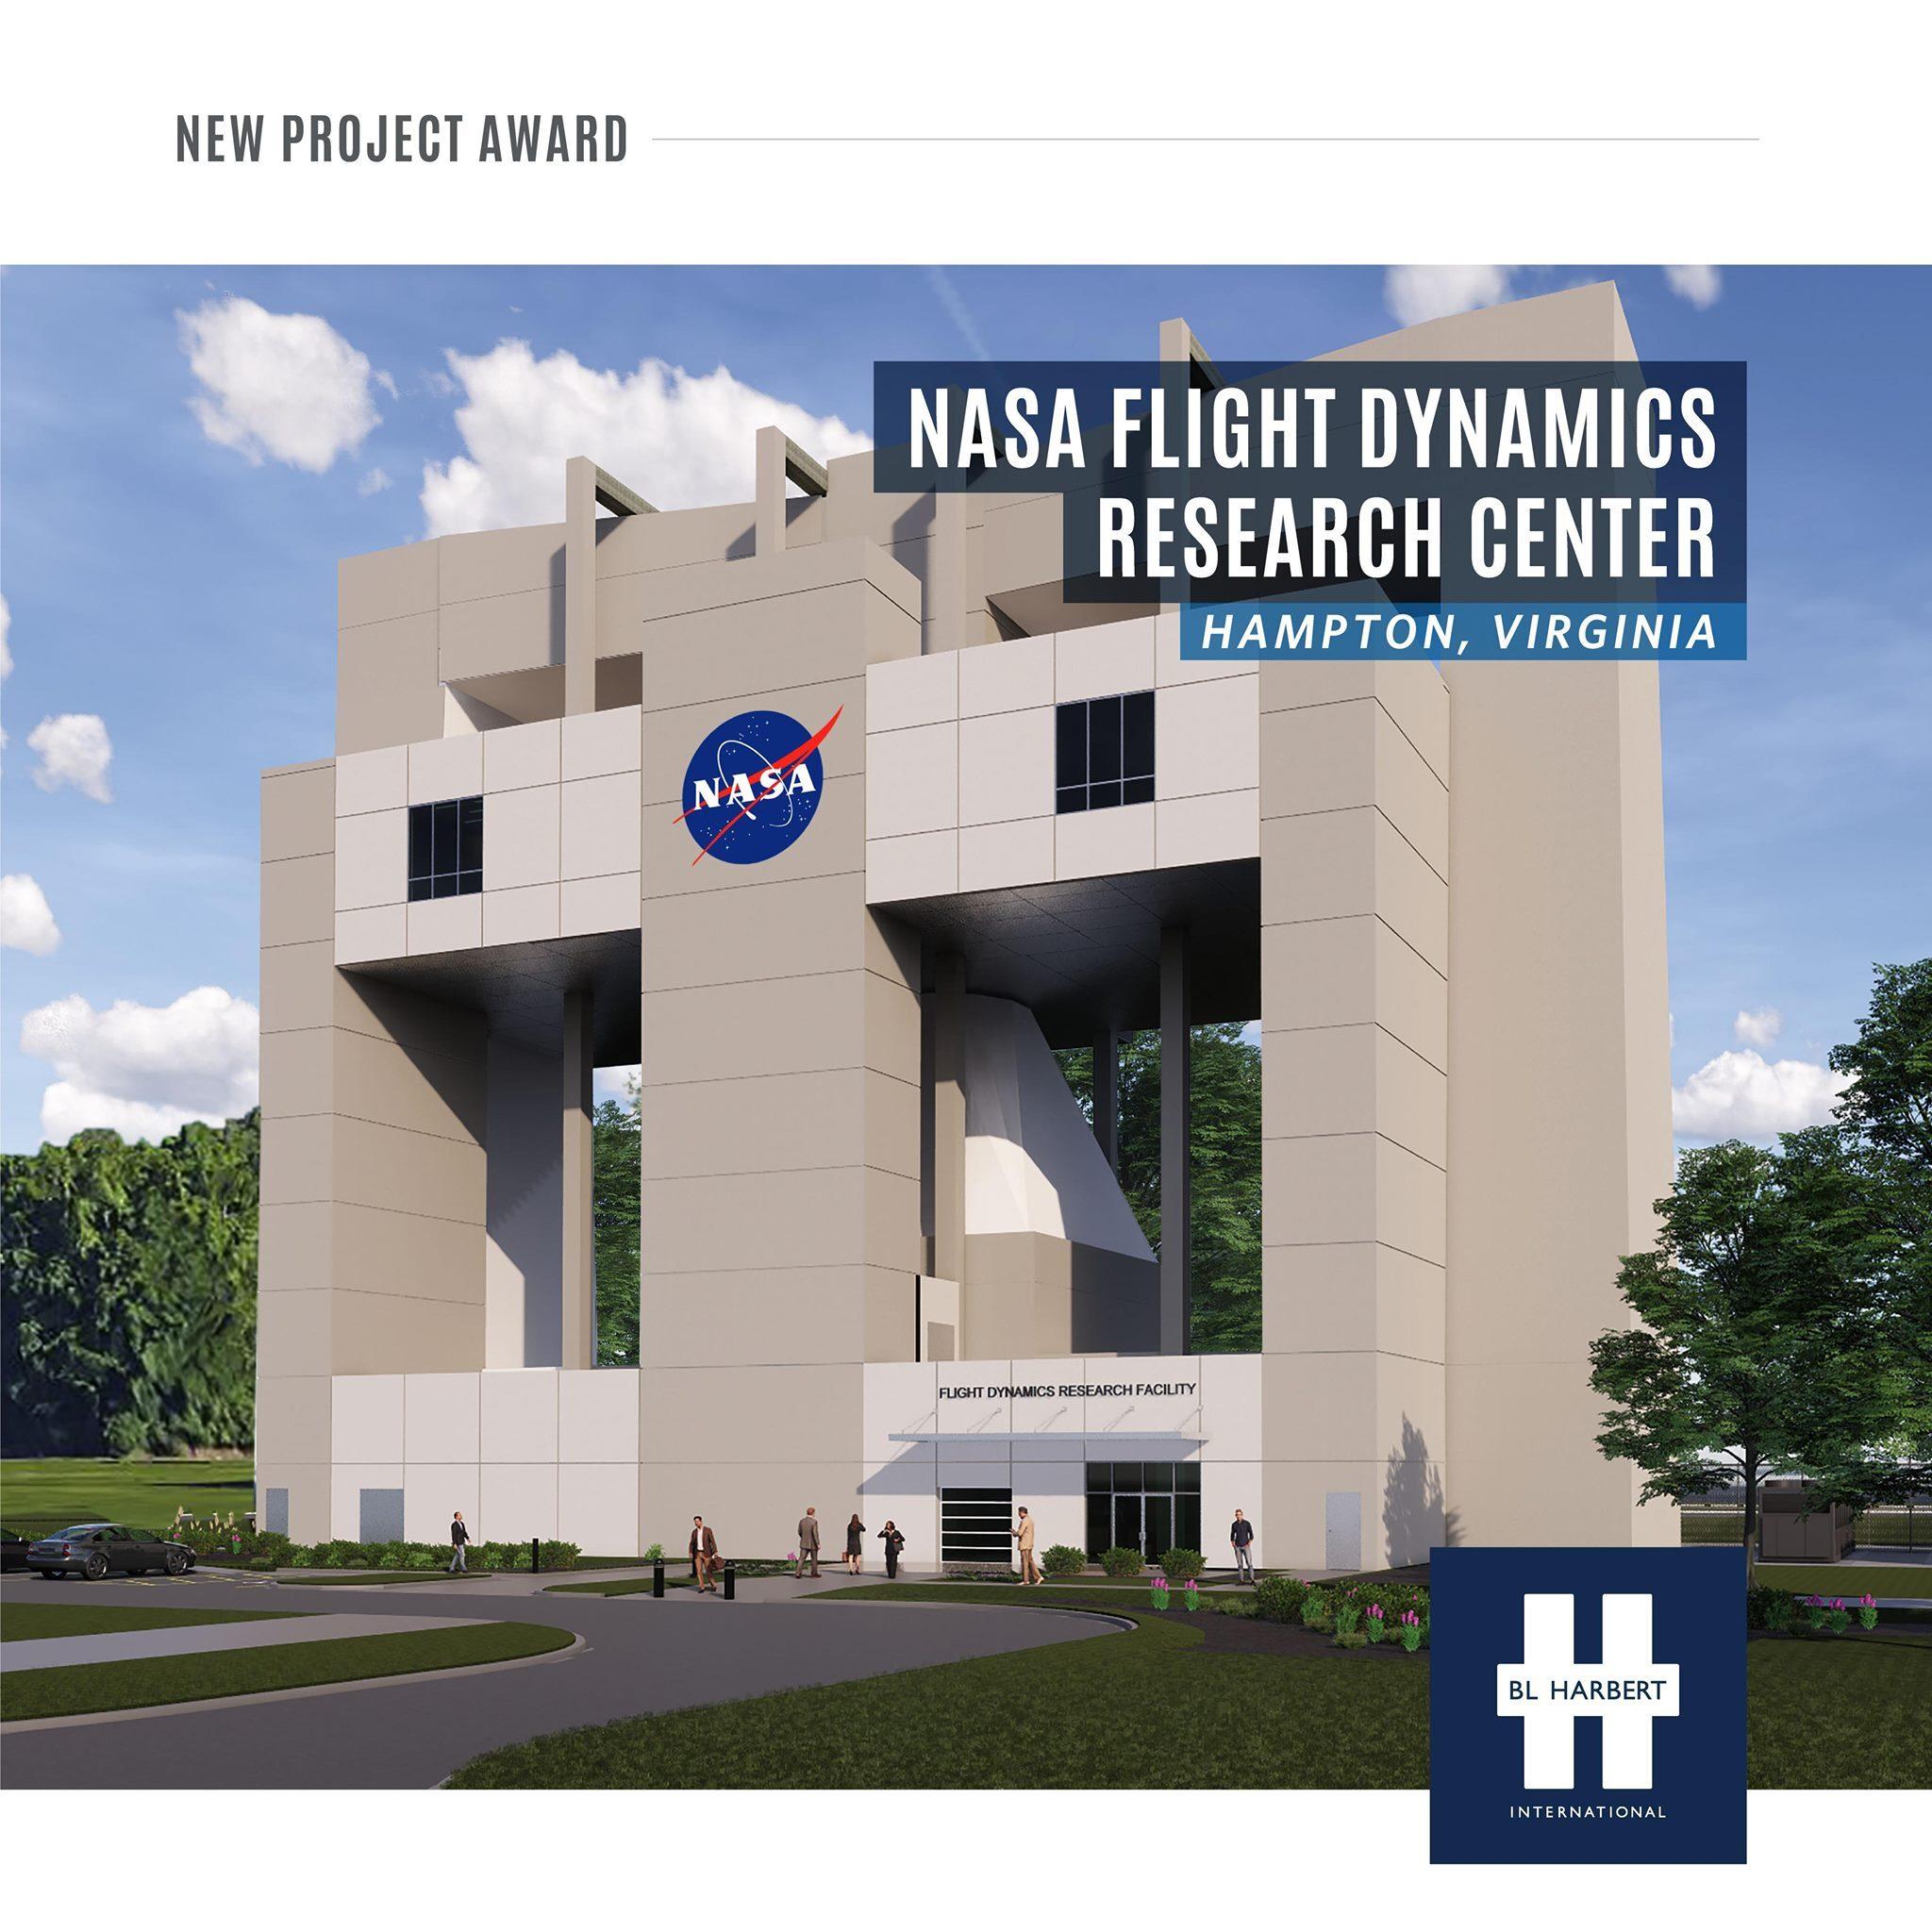 New .2M contract between B.L. Harbert and NASA takes flight